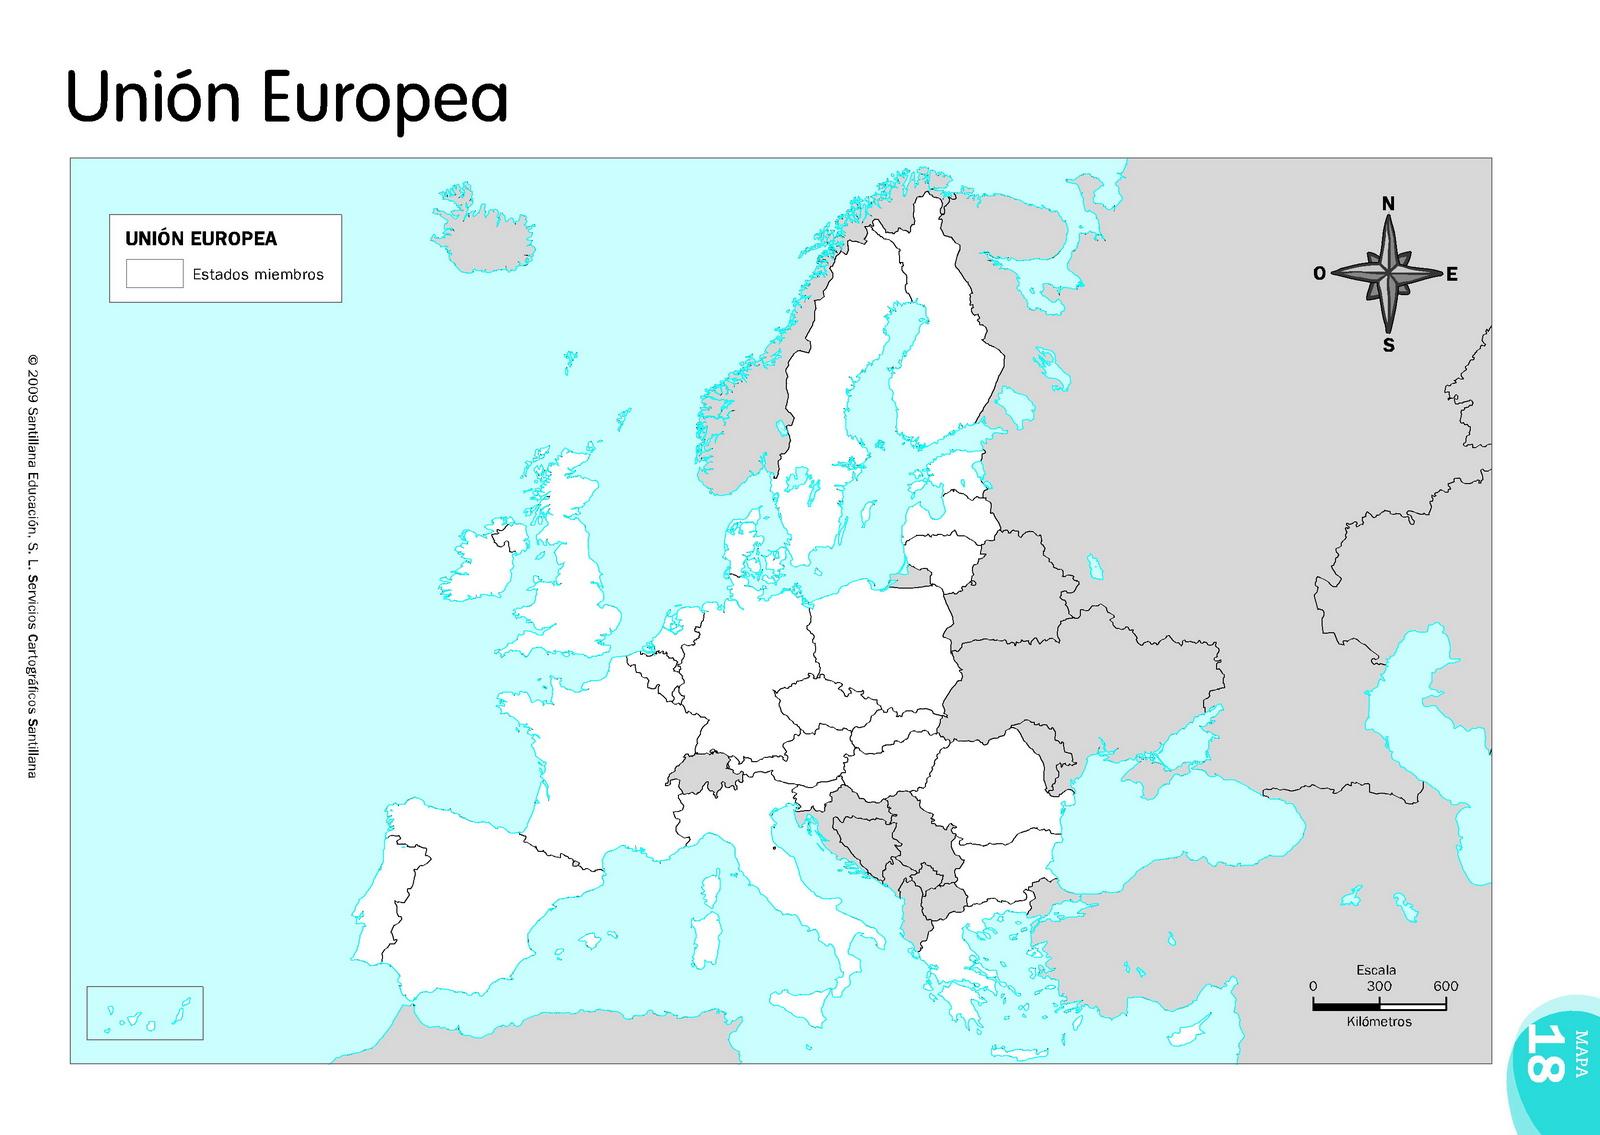 Mapa Politico Union Europea Mudo.La Union Europea Laclasedeptdemontse